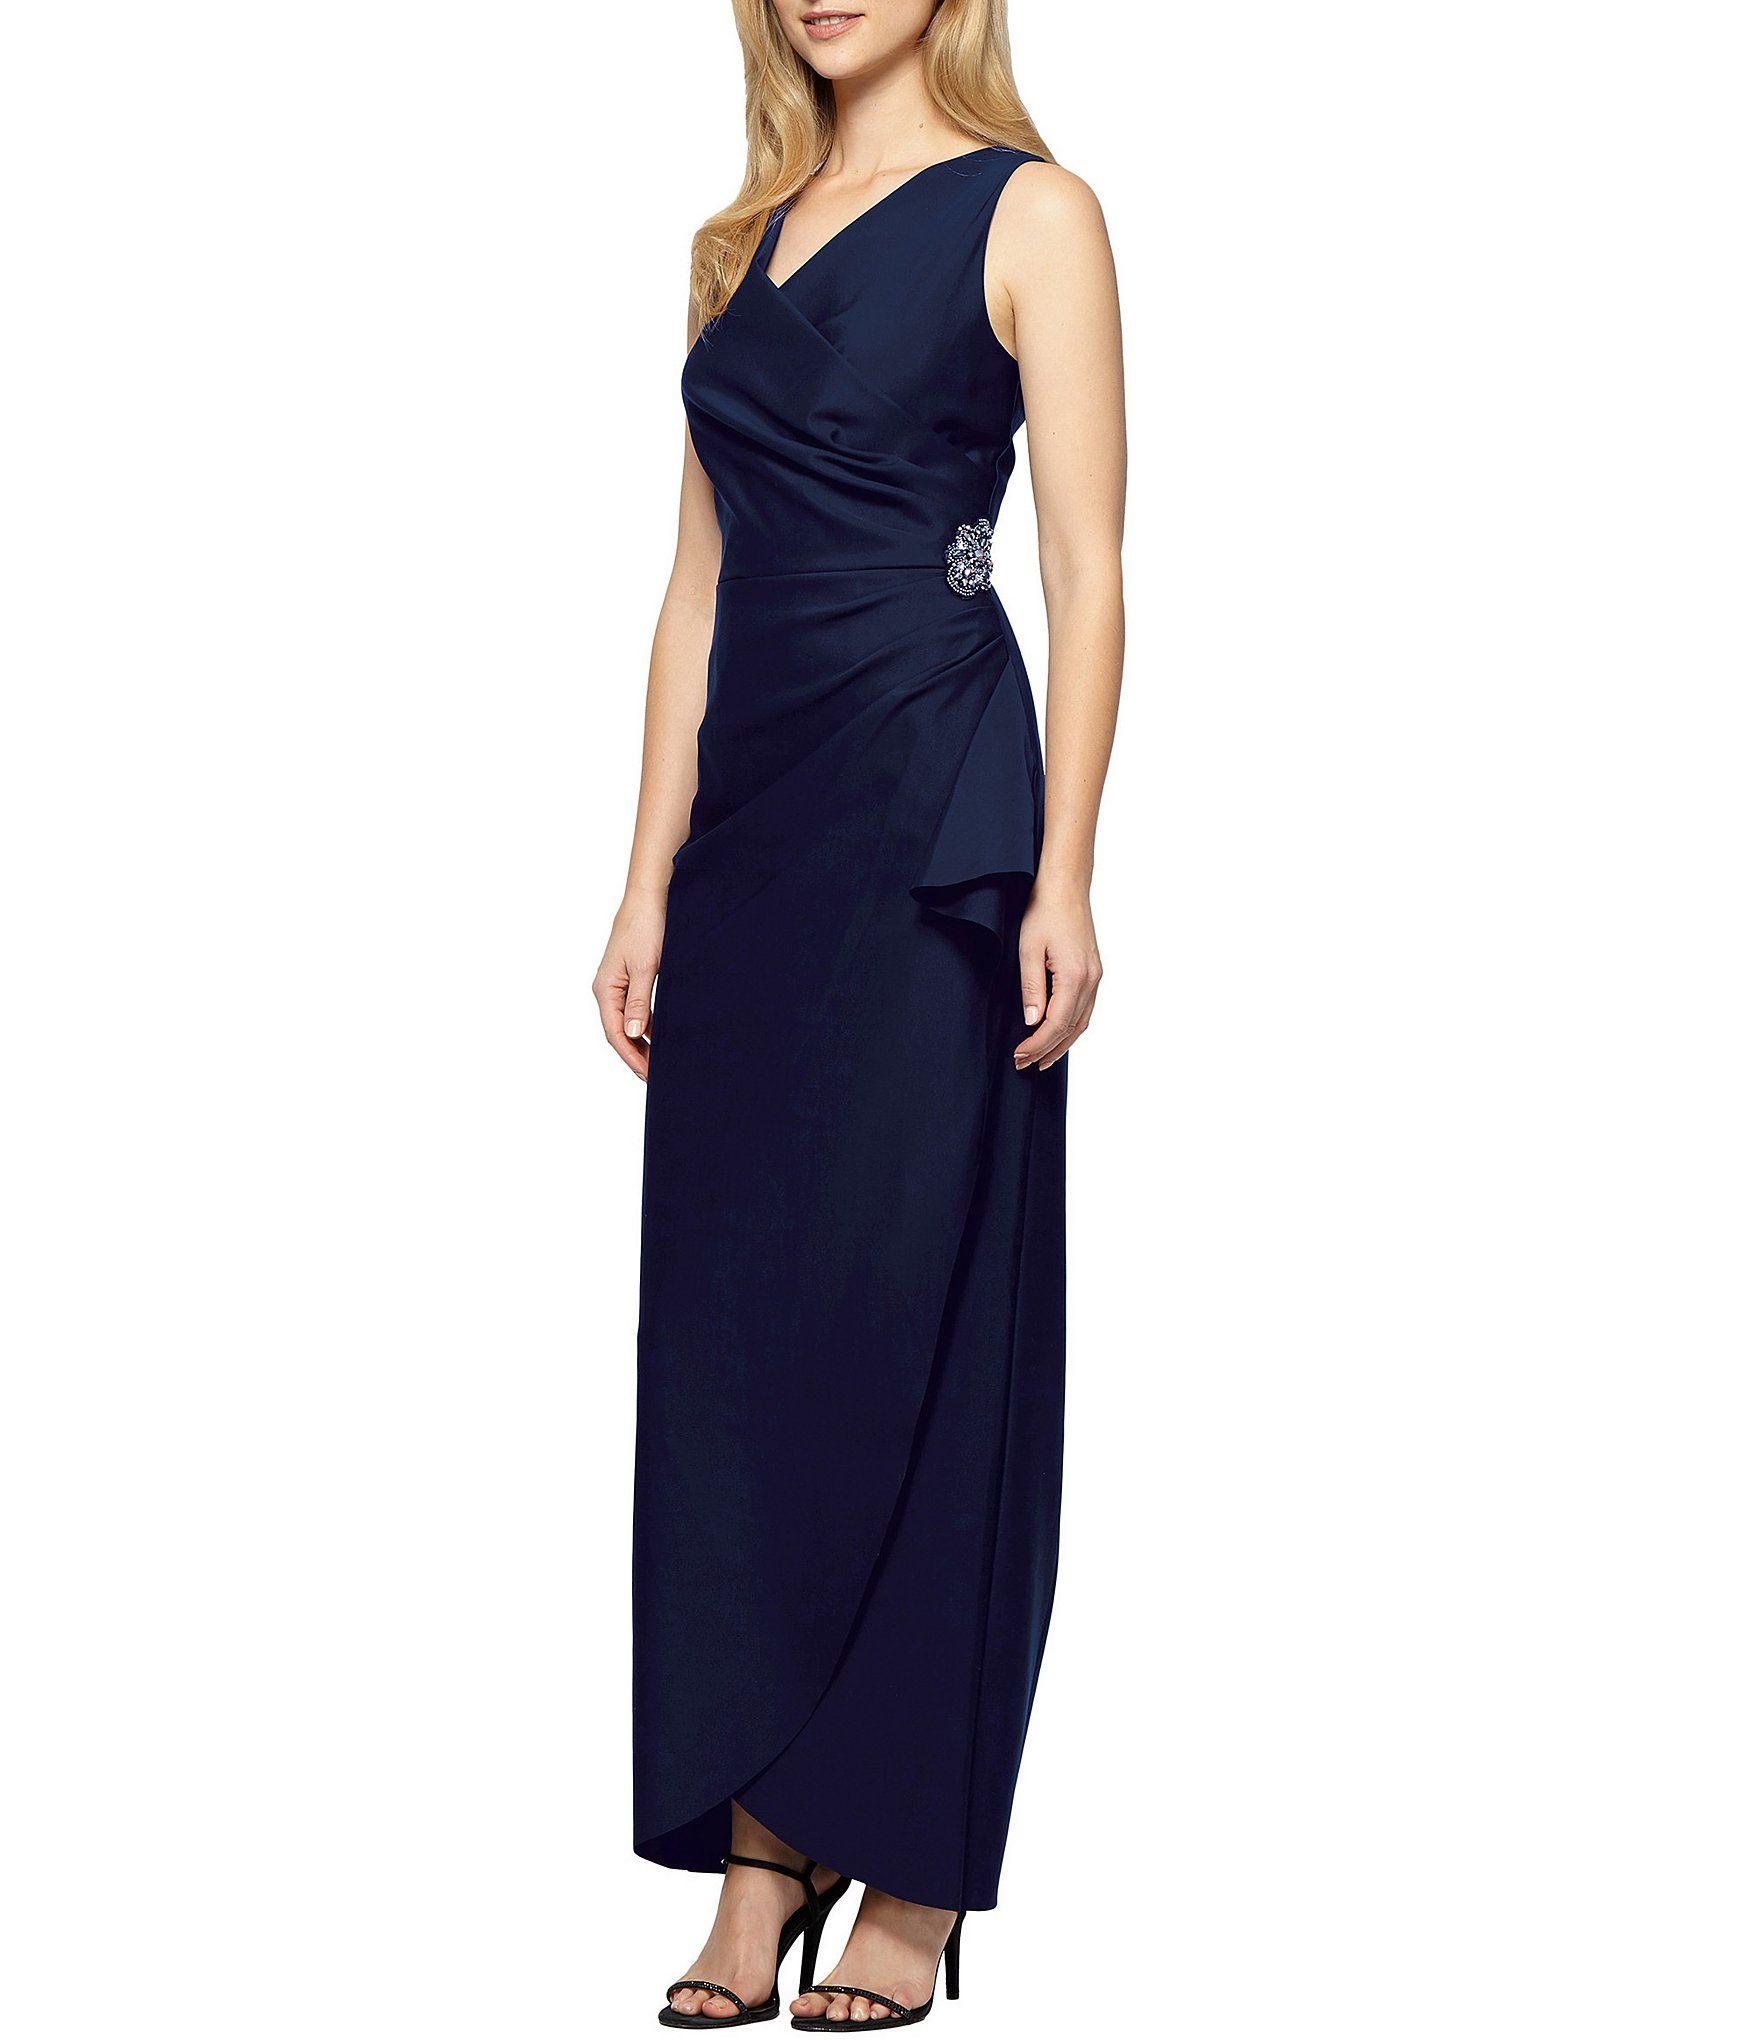 Alex Evenings Sleeveless Surplice Neckline Beaded Detail Sheath Dress #Dillards